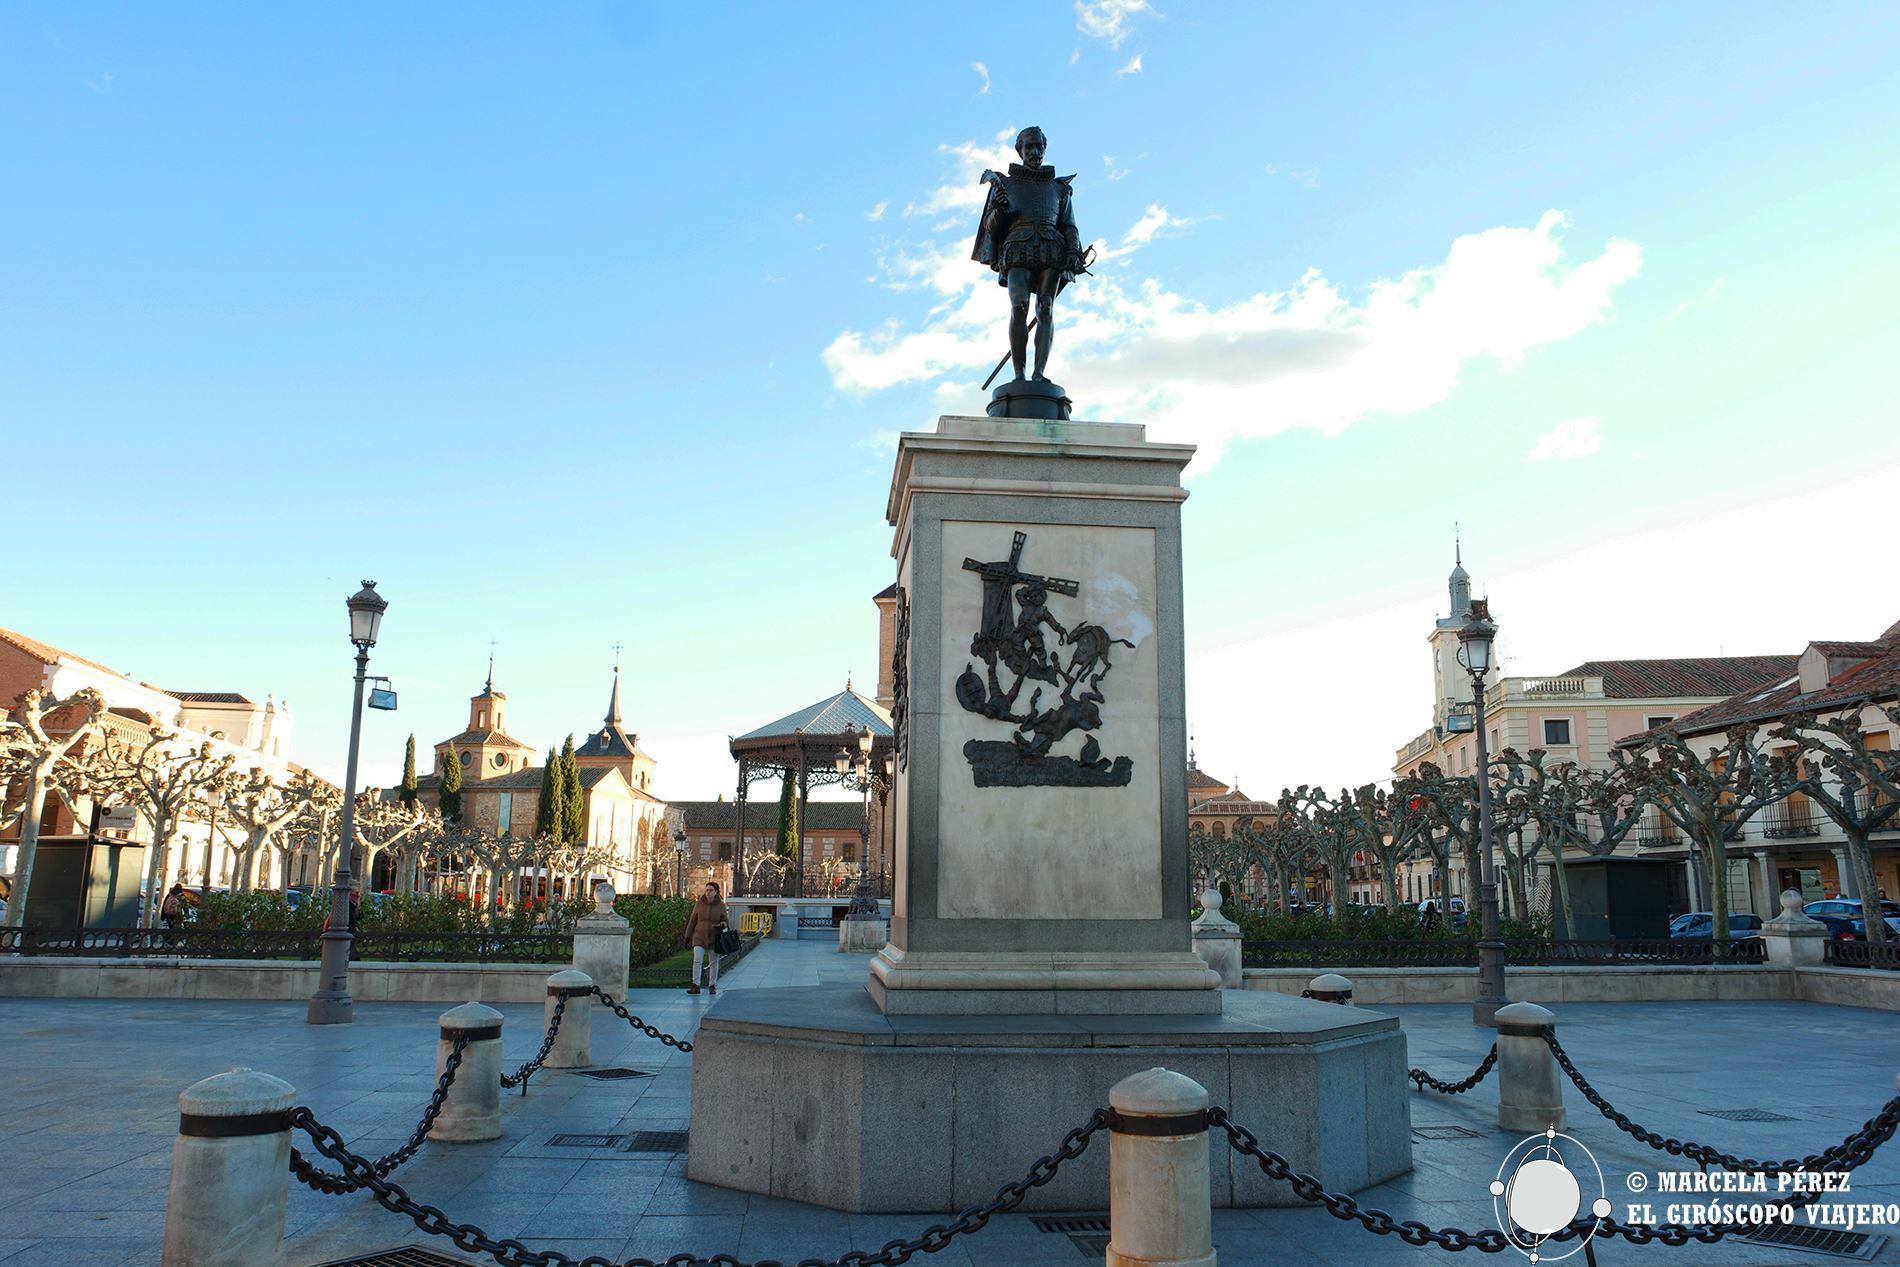 La figura de Cervantes como símbolo de Alcalá de Henares